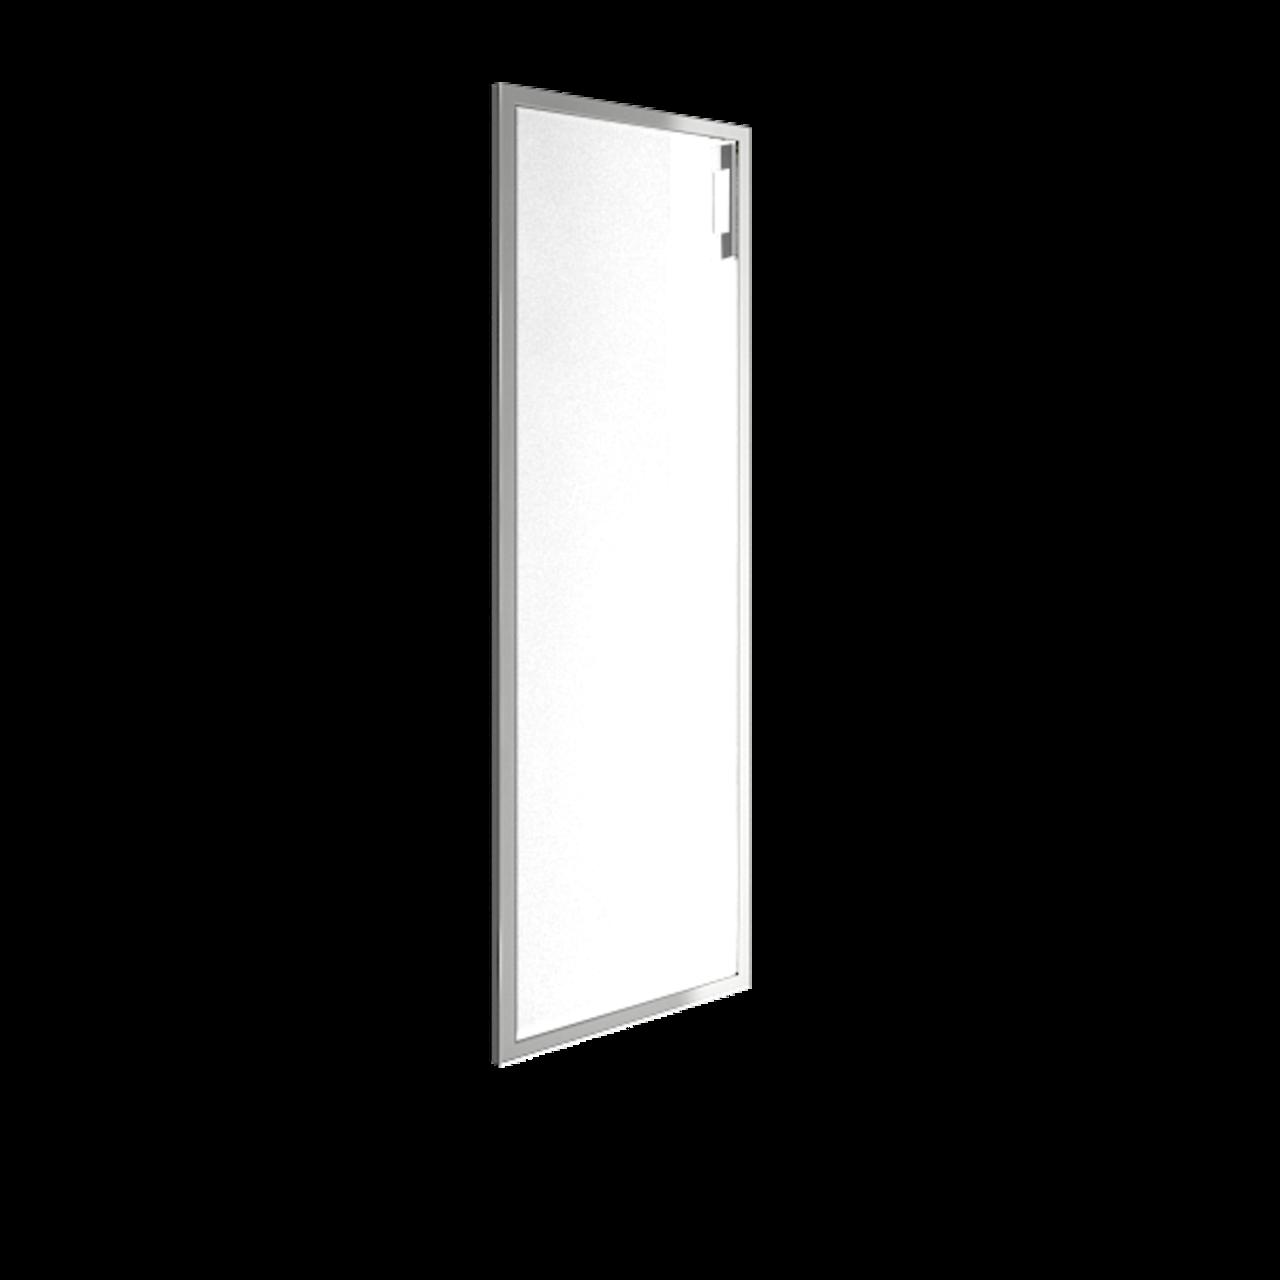 Дверь стекло в раме среднее Lacobel white левая - фото 2